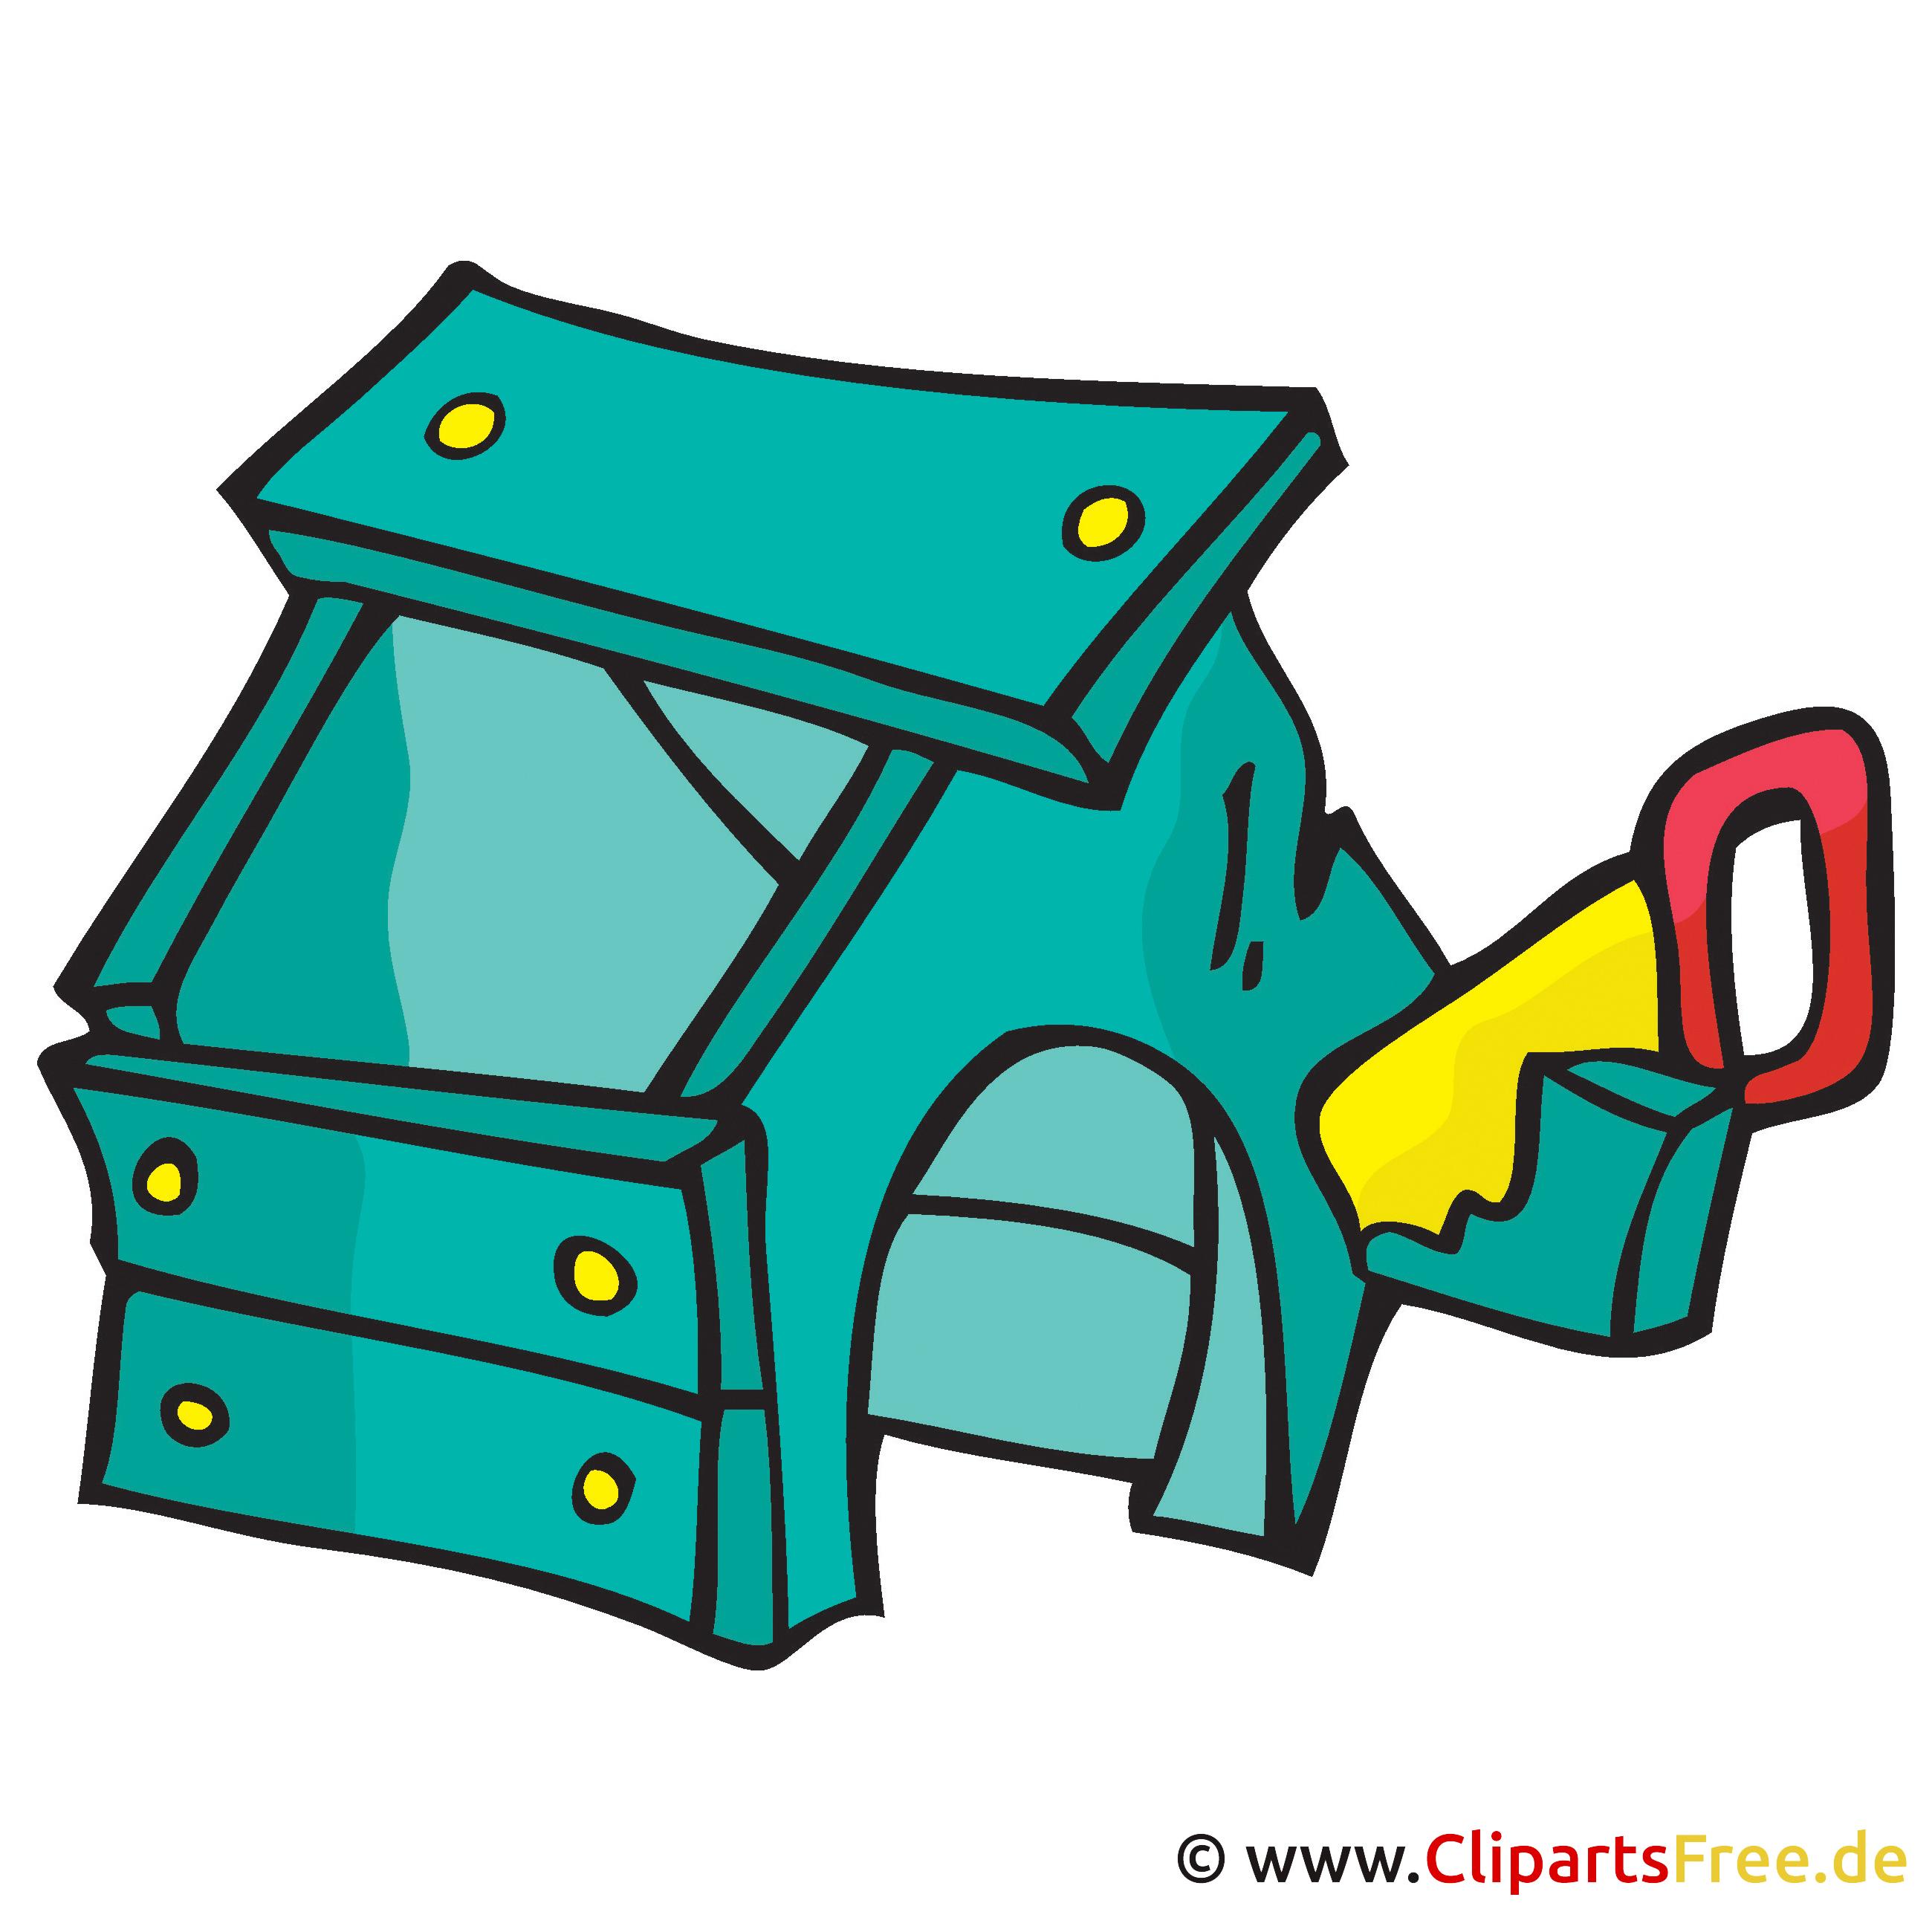 Hundehütte Clipart, Bild, Cartoon, Grafik, Illustration